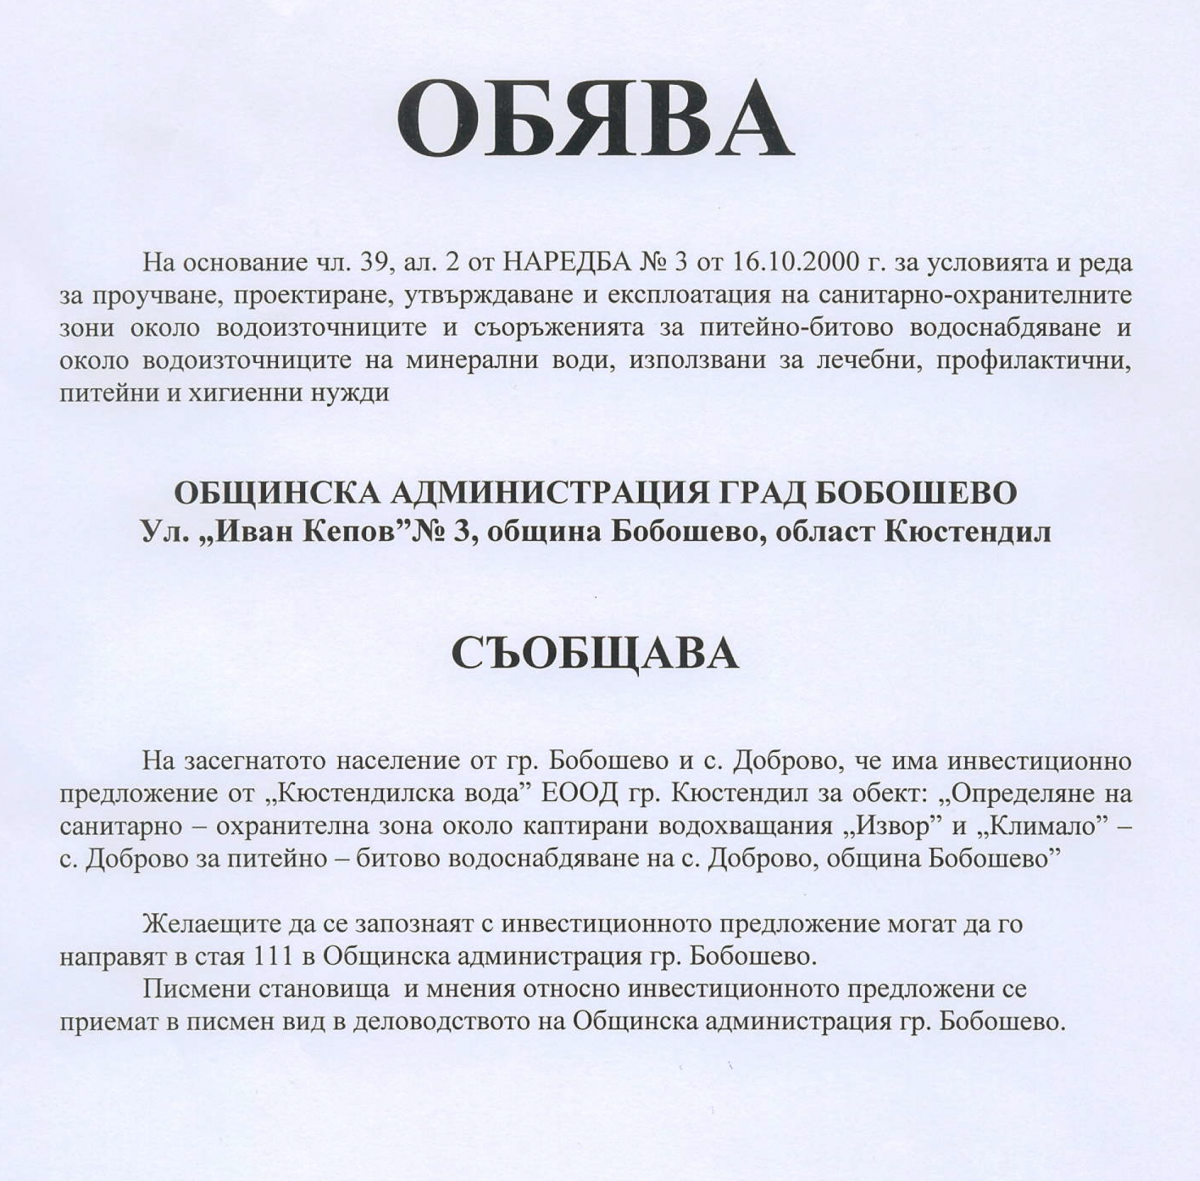 "Инвестиционно предложение ""Кюстендилска вода"" ЕООД - с.Доброво"